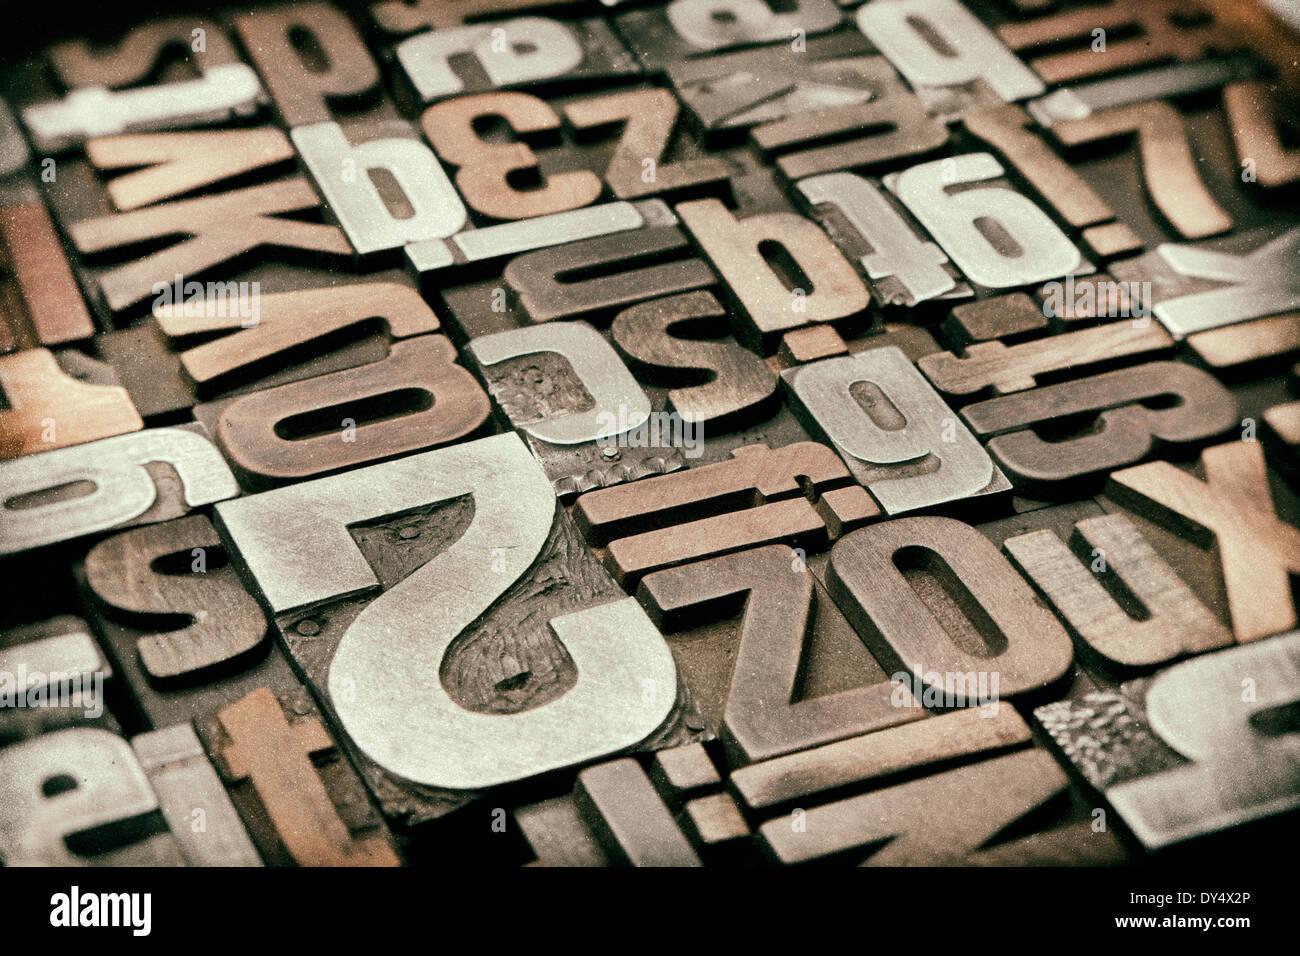 Background of antique letterpress printing blocks, vintage processing - Stock Image